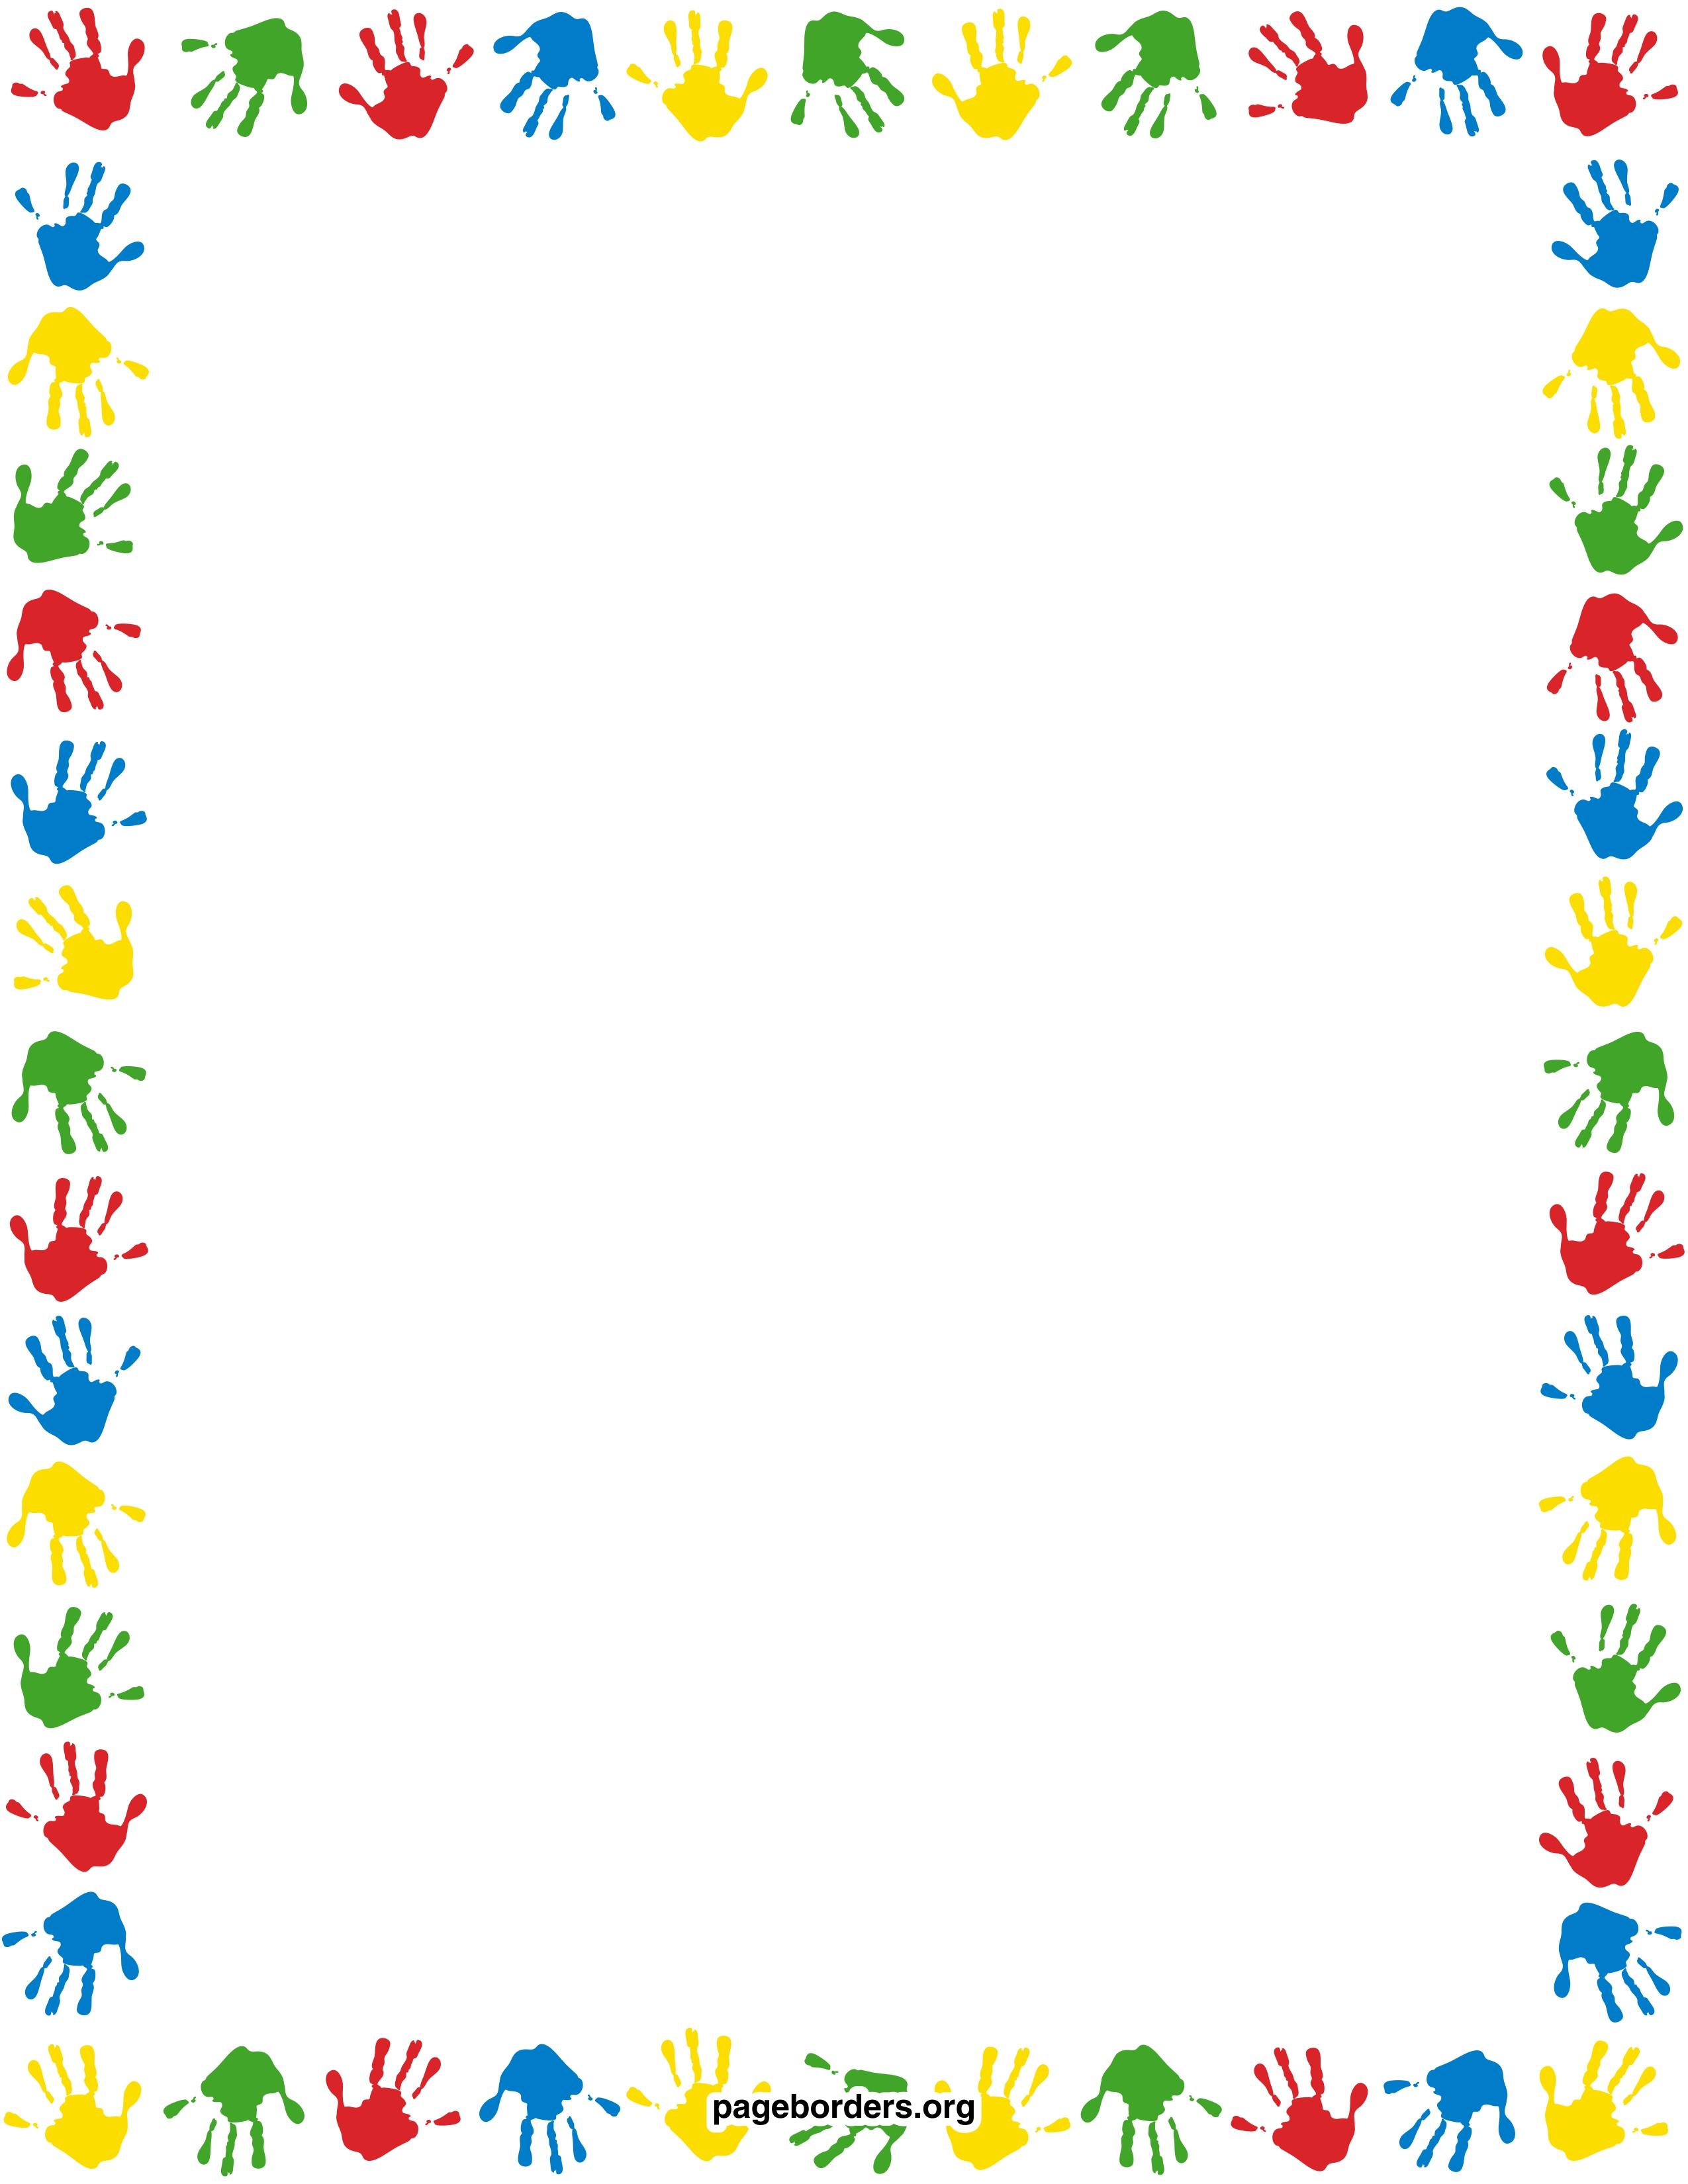 image royalty free stock Preschool clipart borders. Border clipartfest wikiclipart